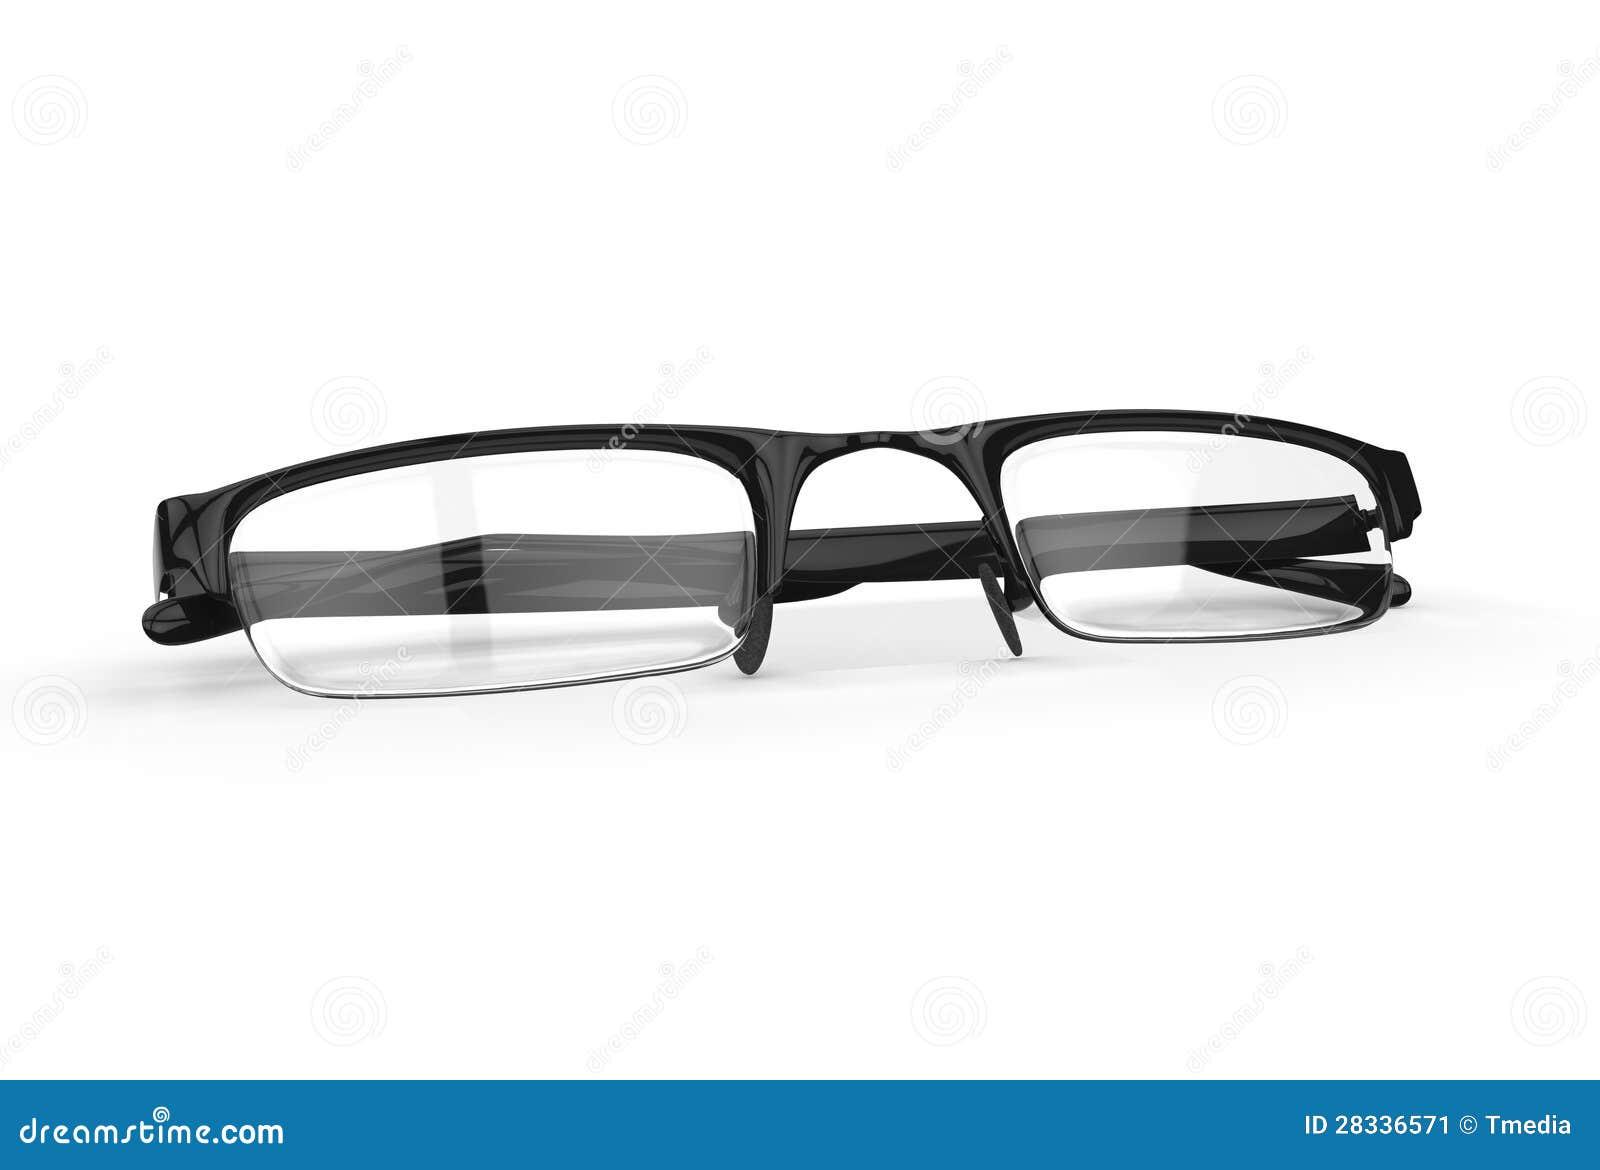 Black Framed Fashion Glasses Stock Image - Image: 28336571